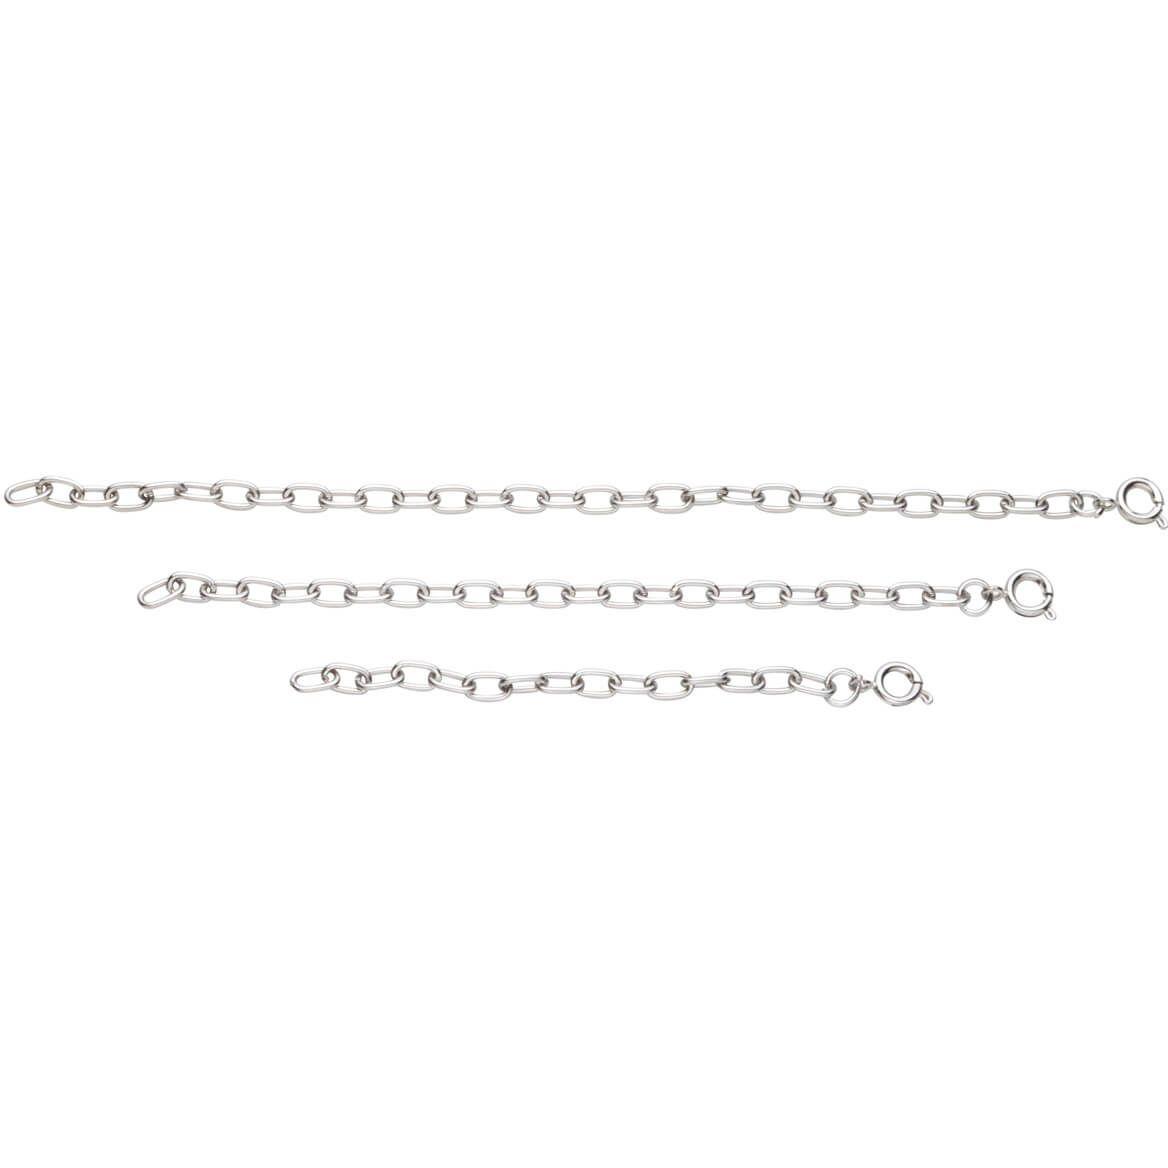 Necklace Extender Set Of 3-310558